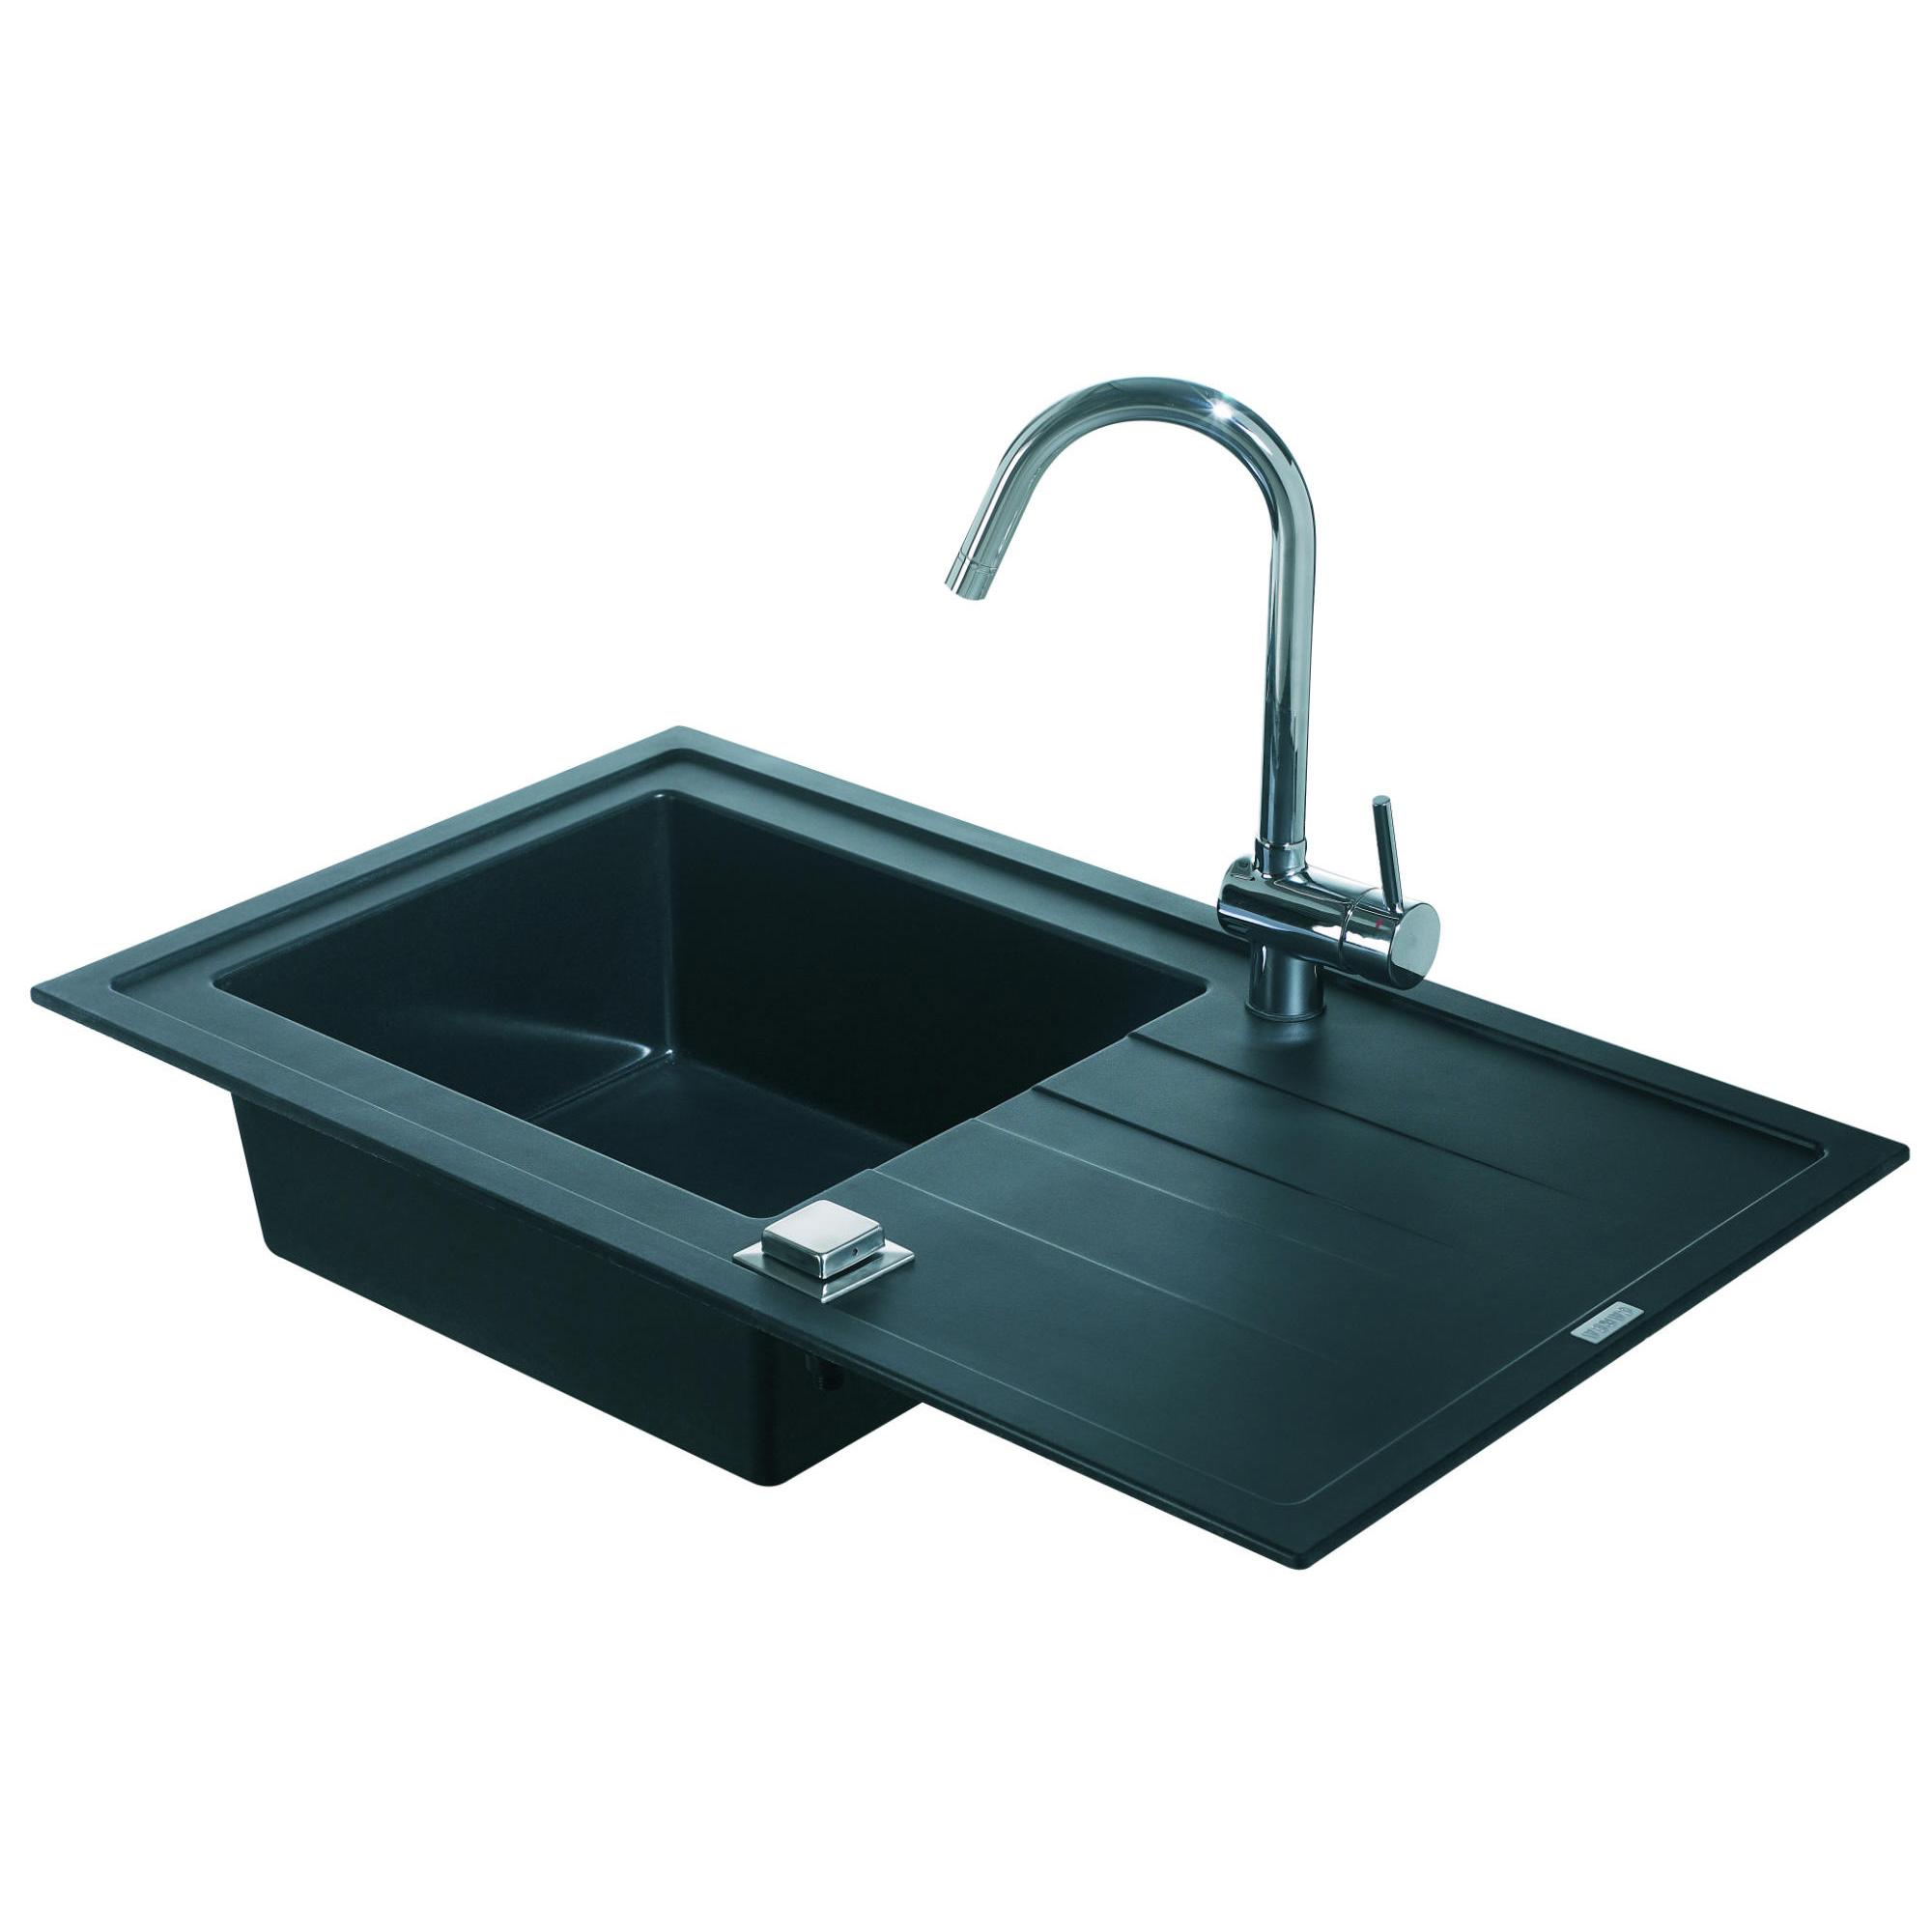 evier encastrer arcos noir graphite 1 cuve. Black Bedroom Furniture Sets. Home Design Ideas